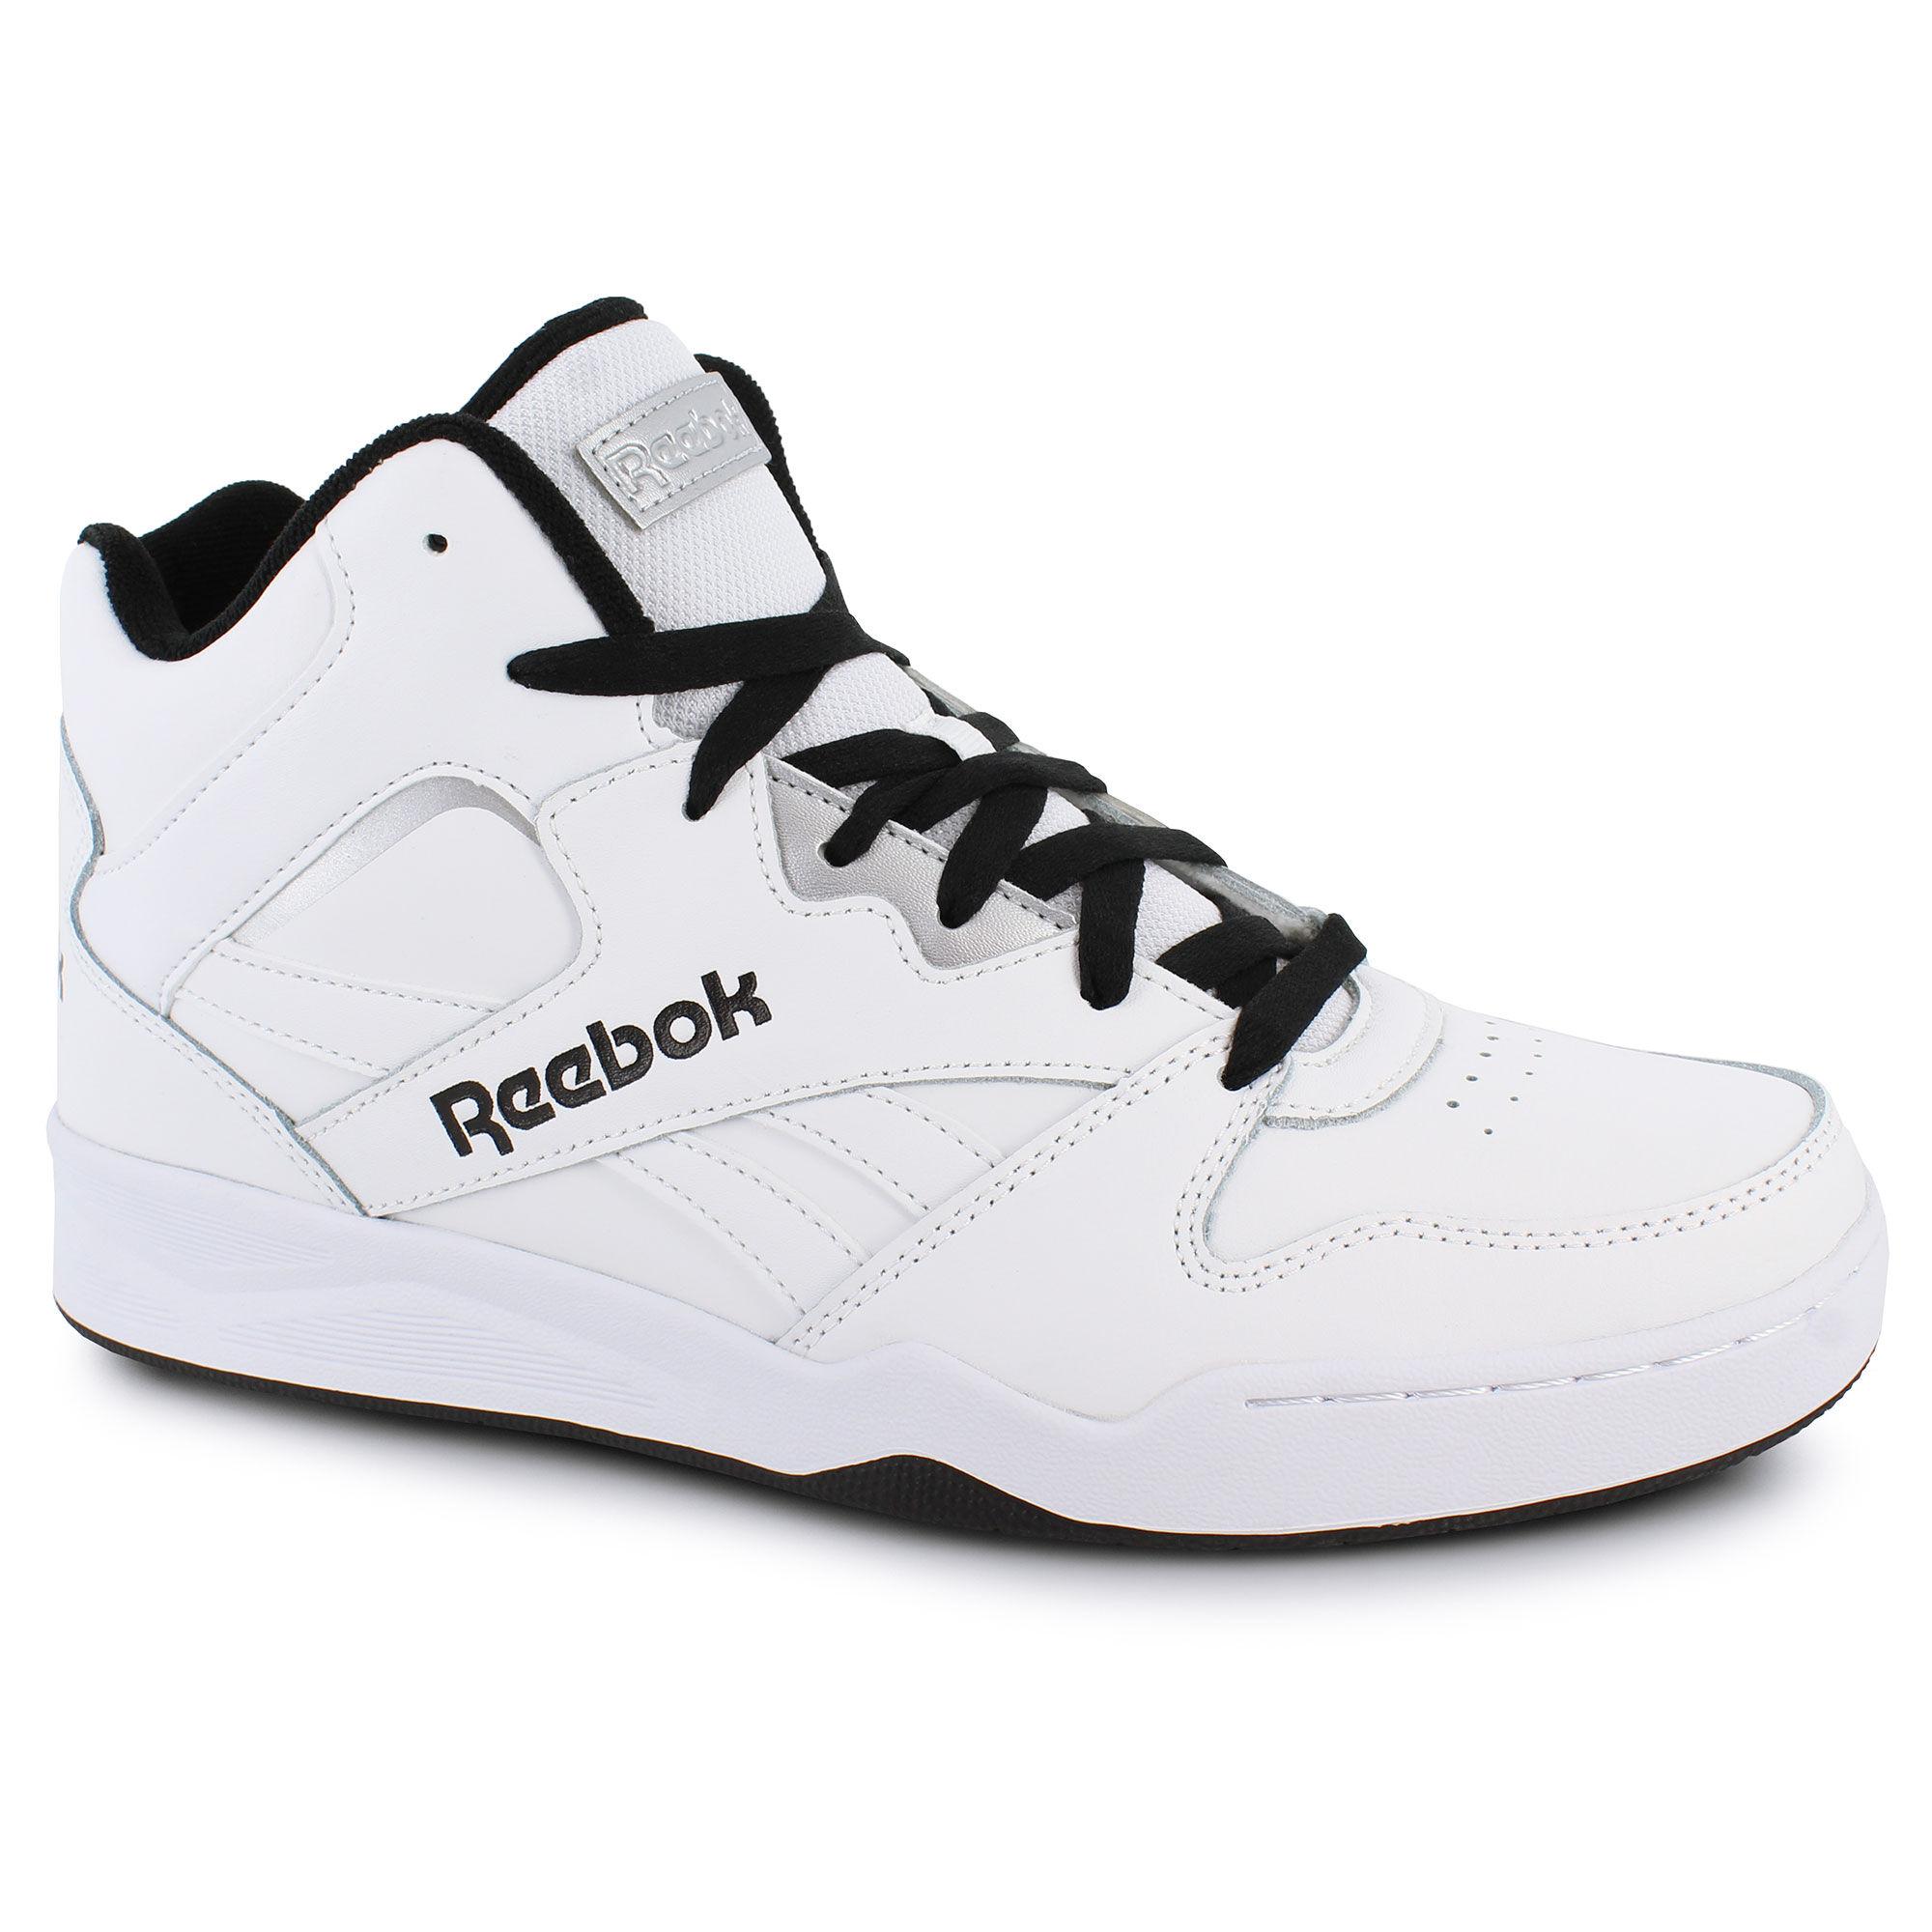 Reebok | Shop Now at SHOE SHOW MEGA